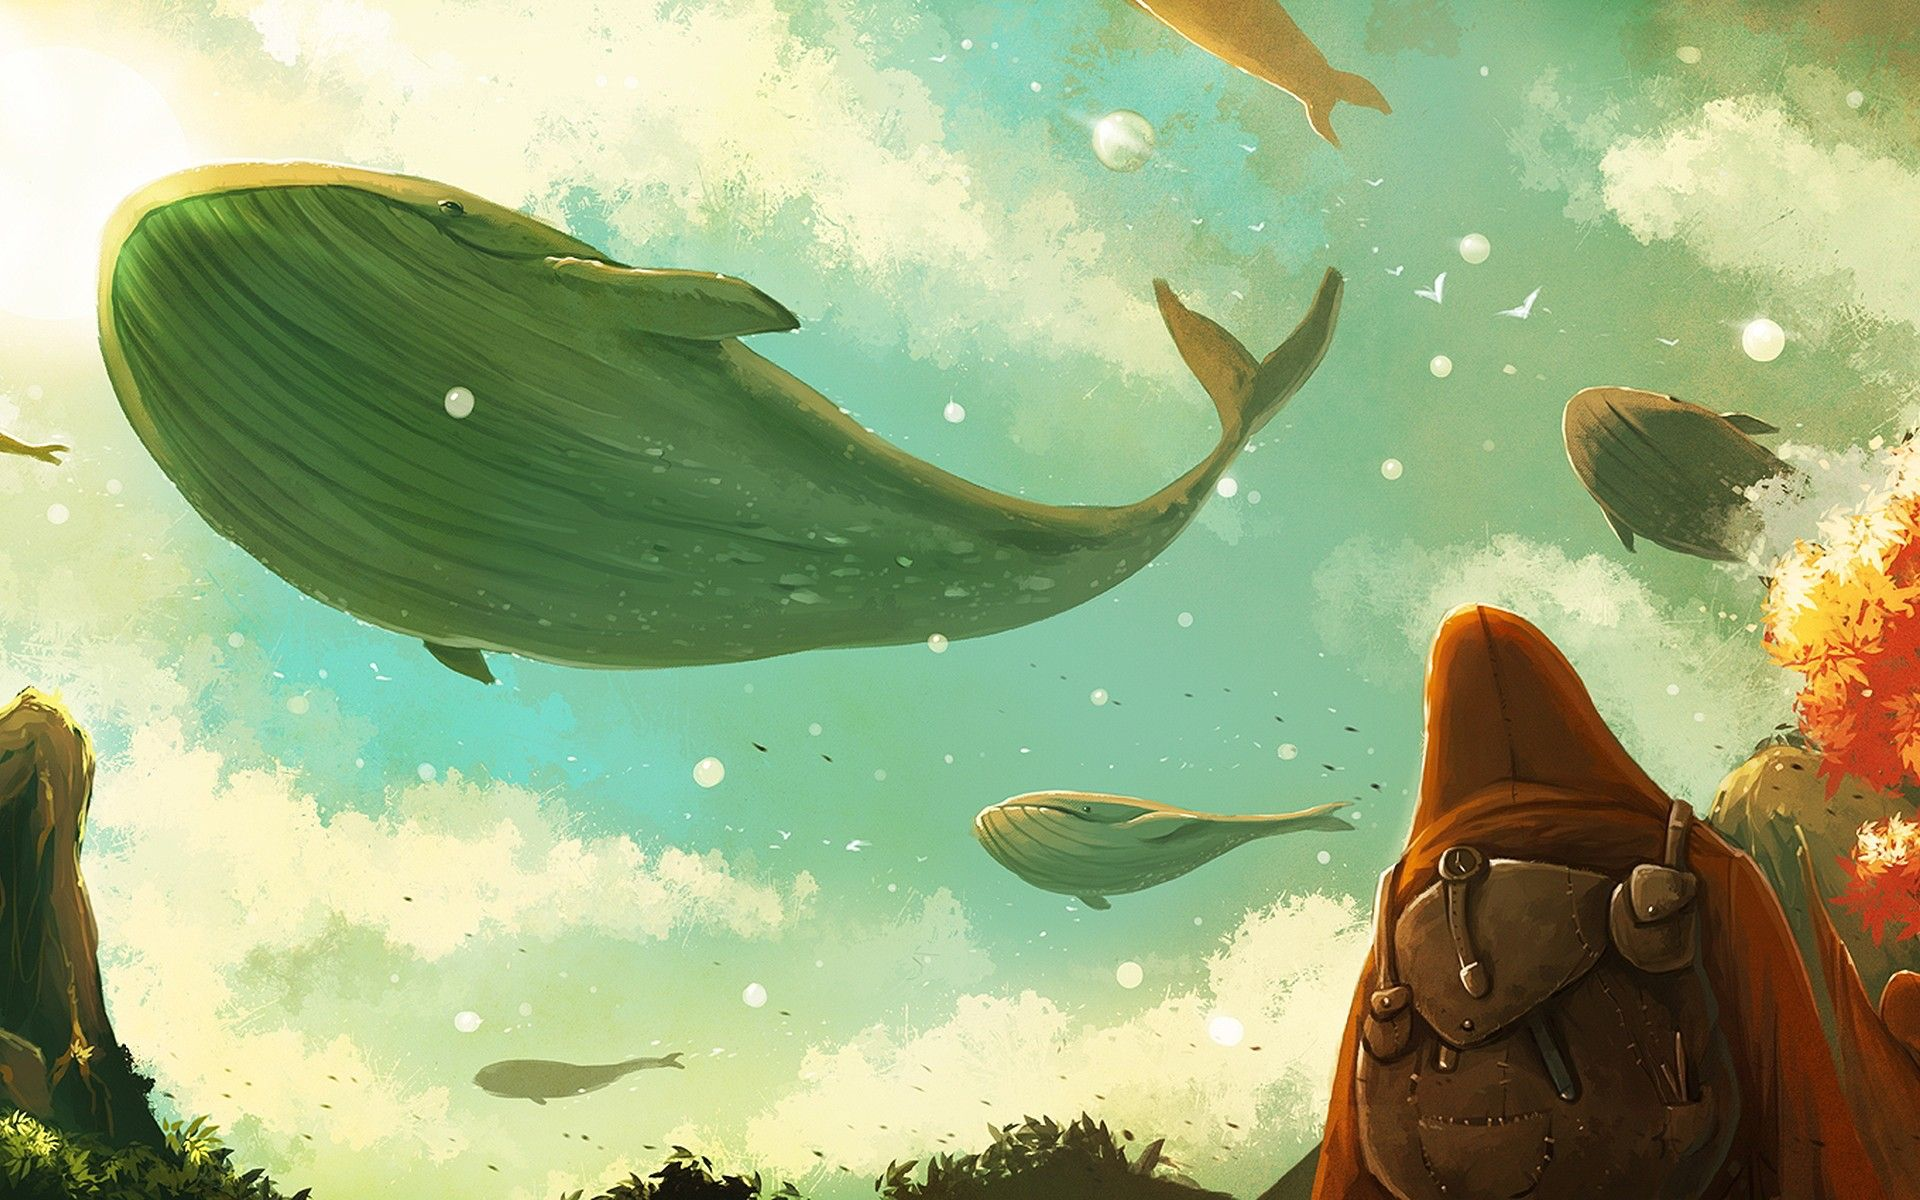 General 1920x1200 flying whale atmosphere surreal backpacks clouds artwork